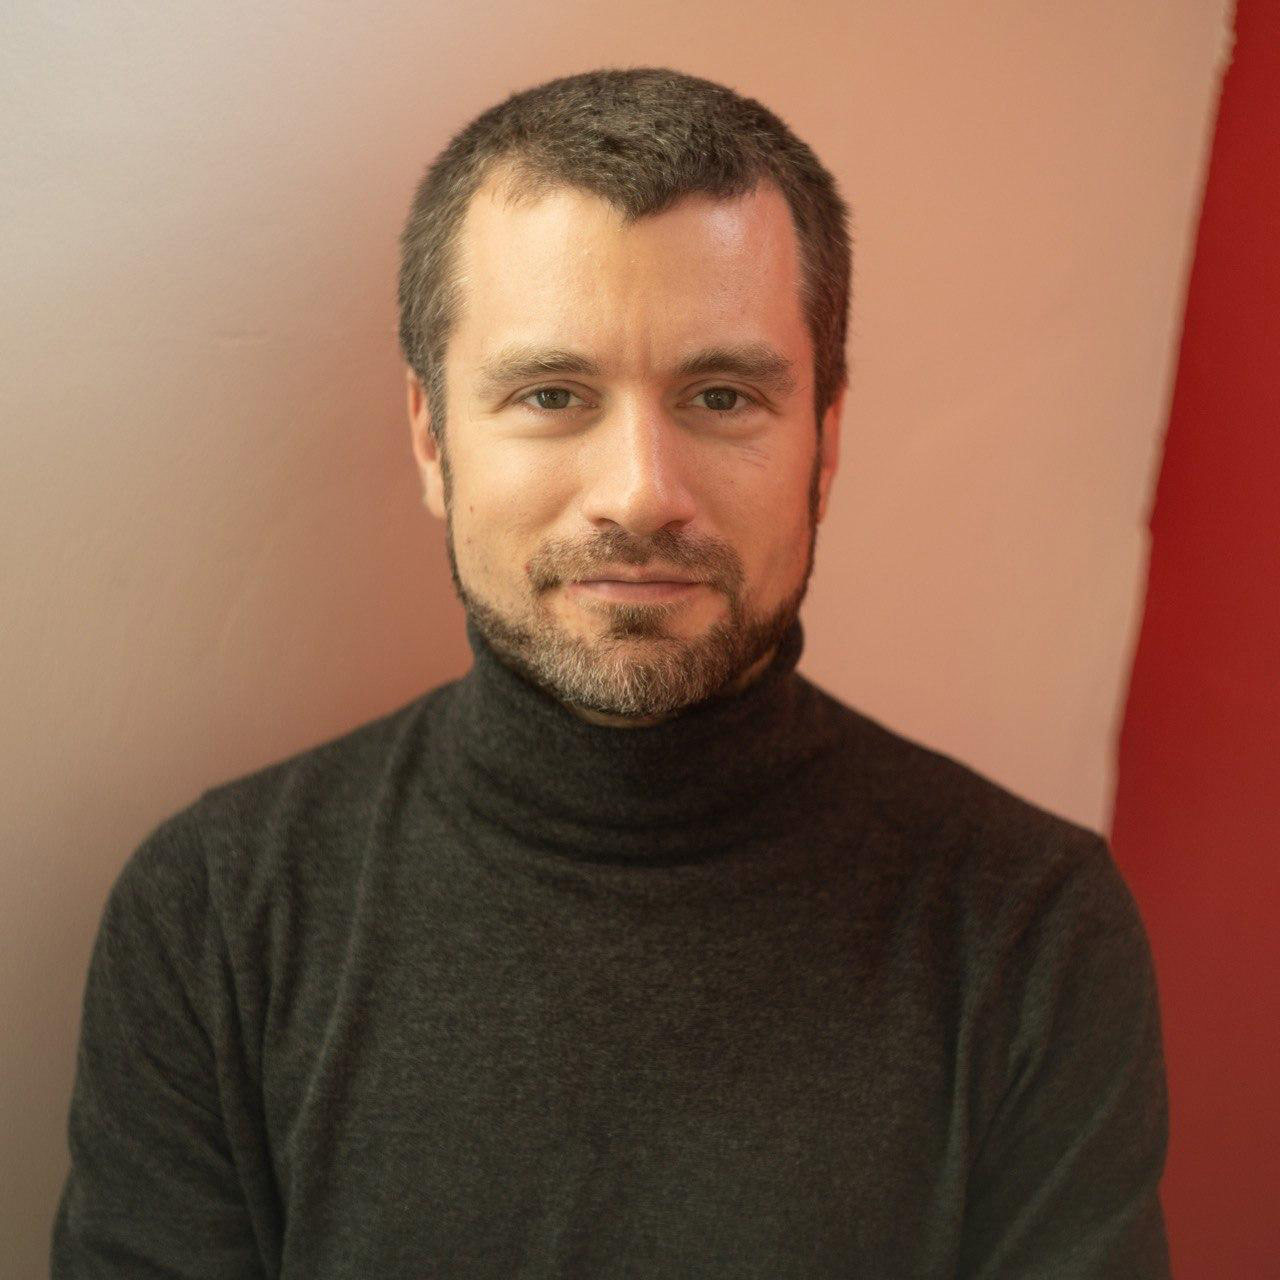 Иван Боганцев. Фото из личного архива